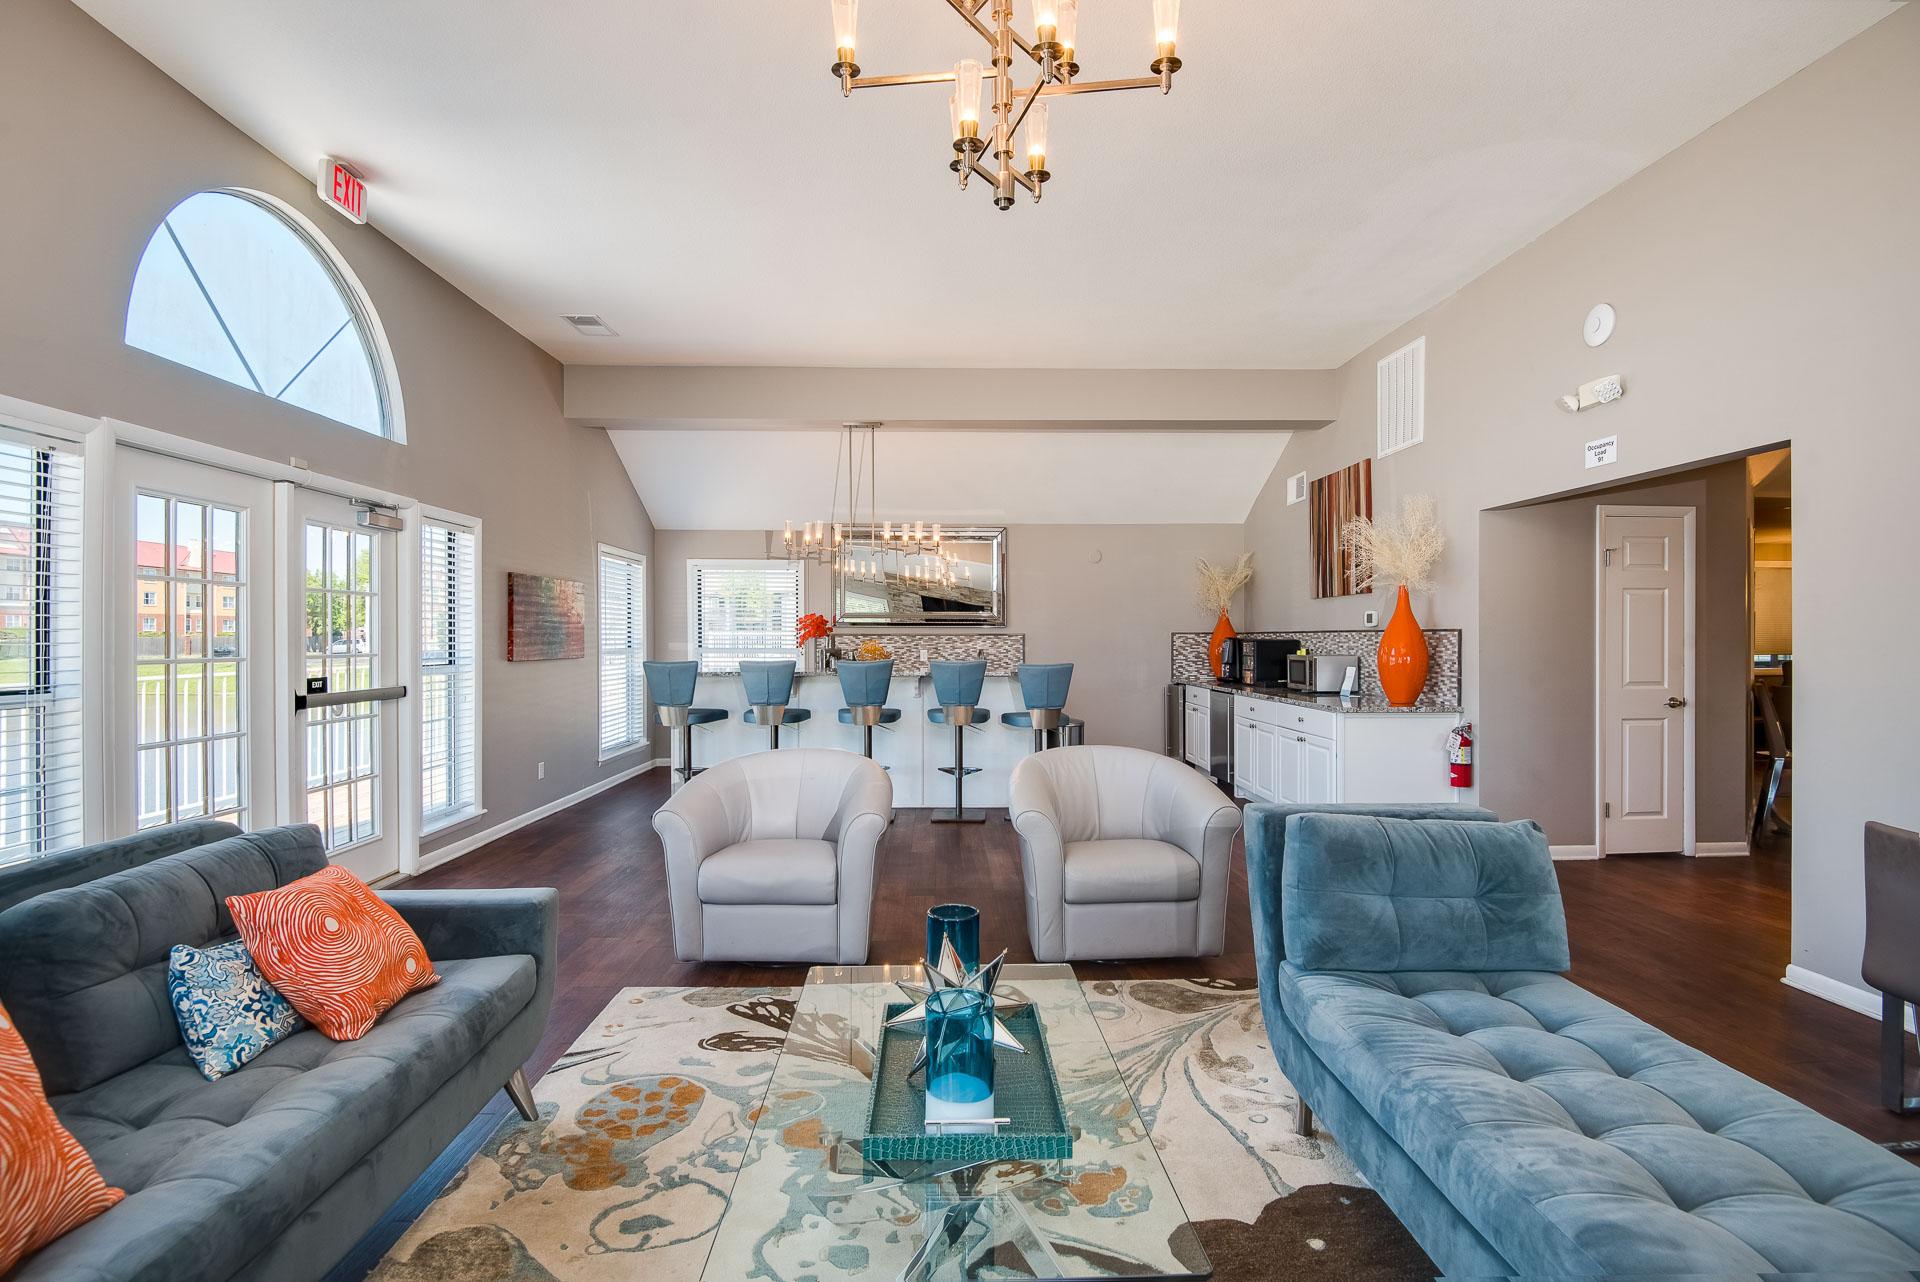 Sherpa Media Kansas City - Apartments & Multi-Family Housing - 25